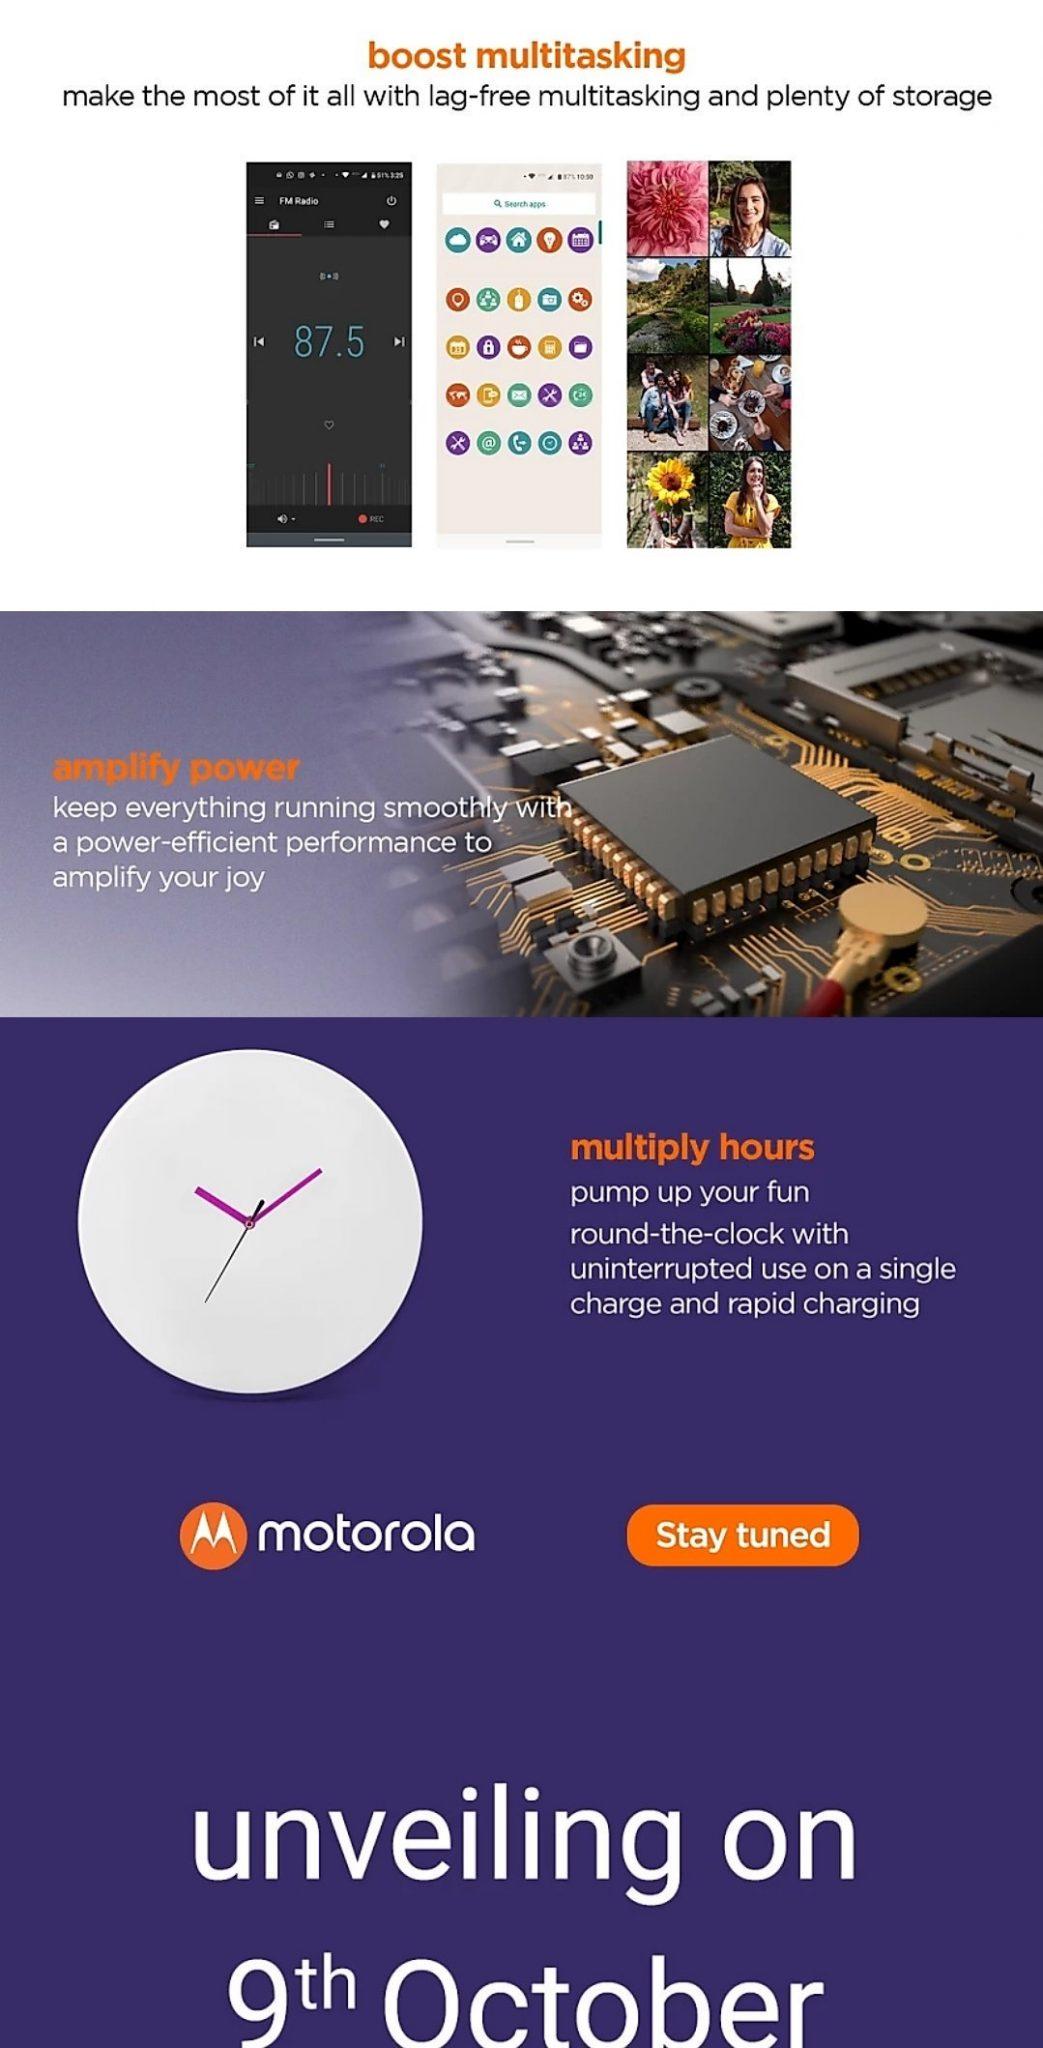 Motorola One Macro to launch on October 9 in India